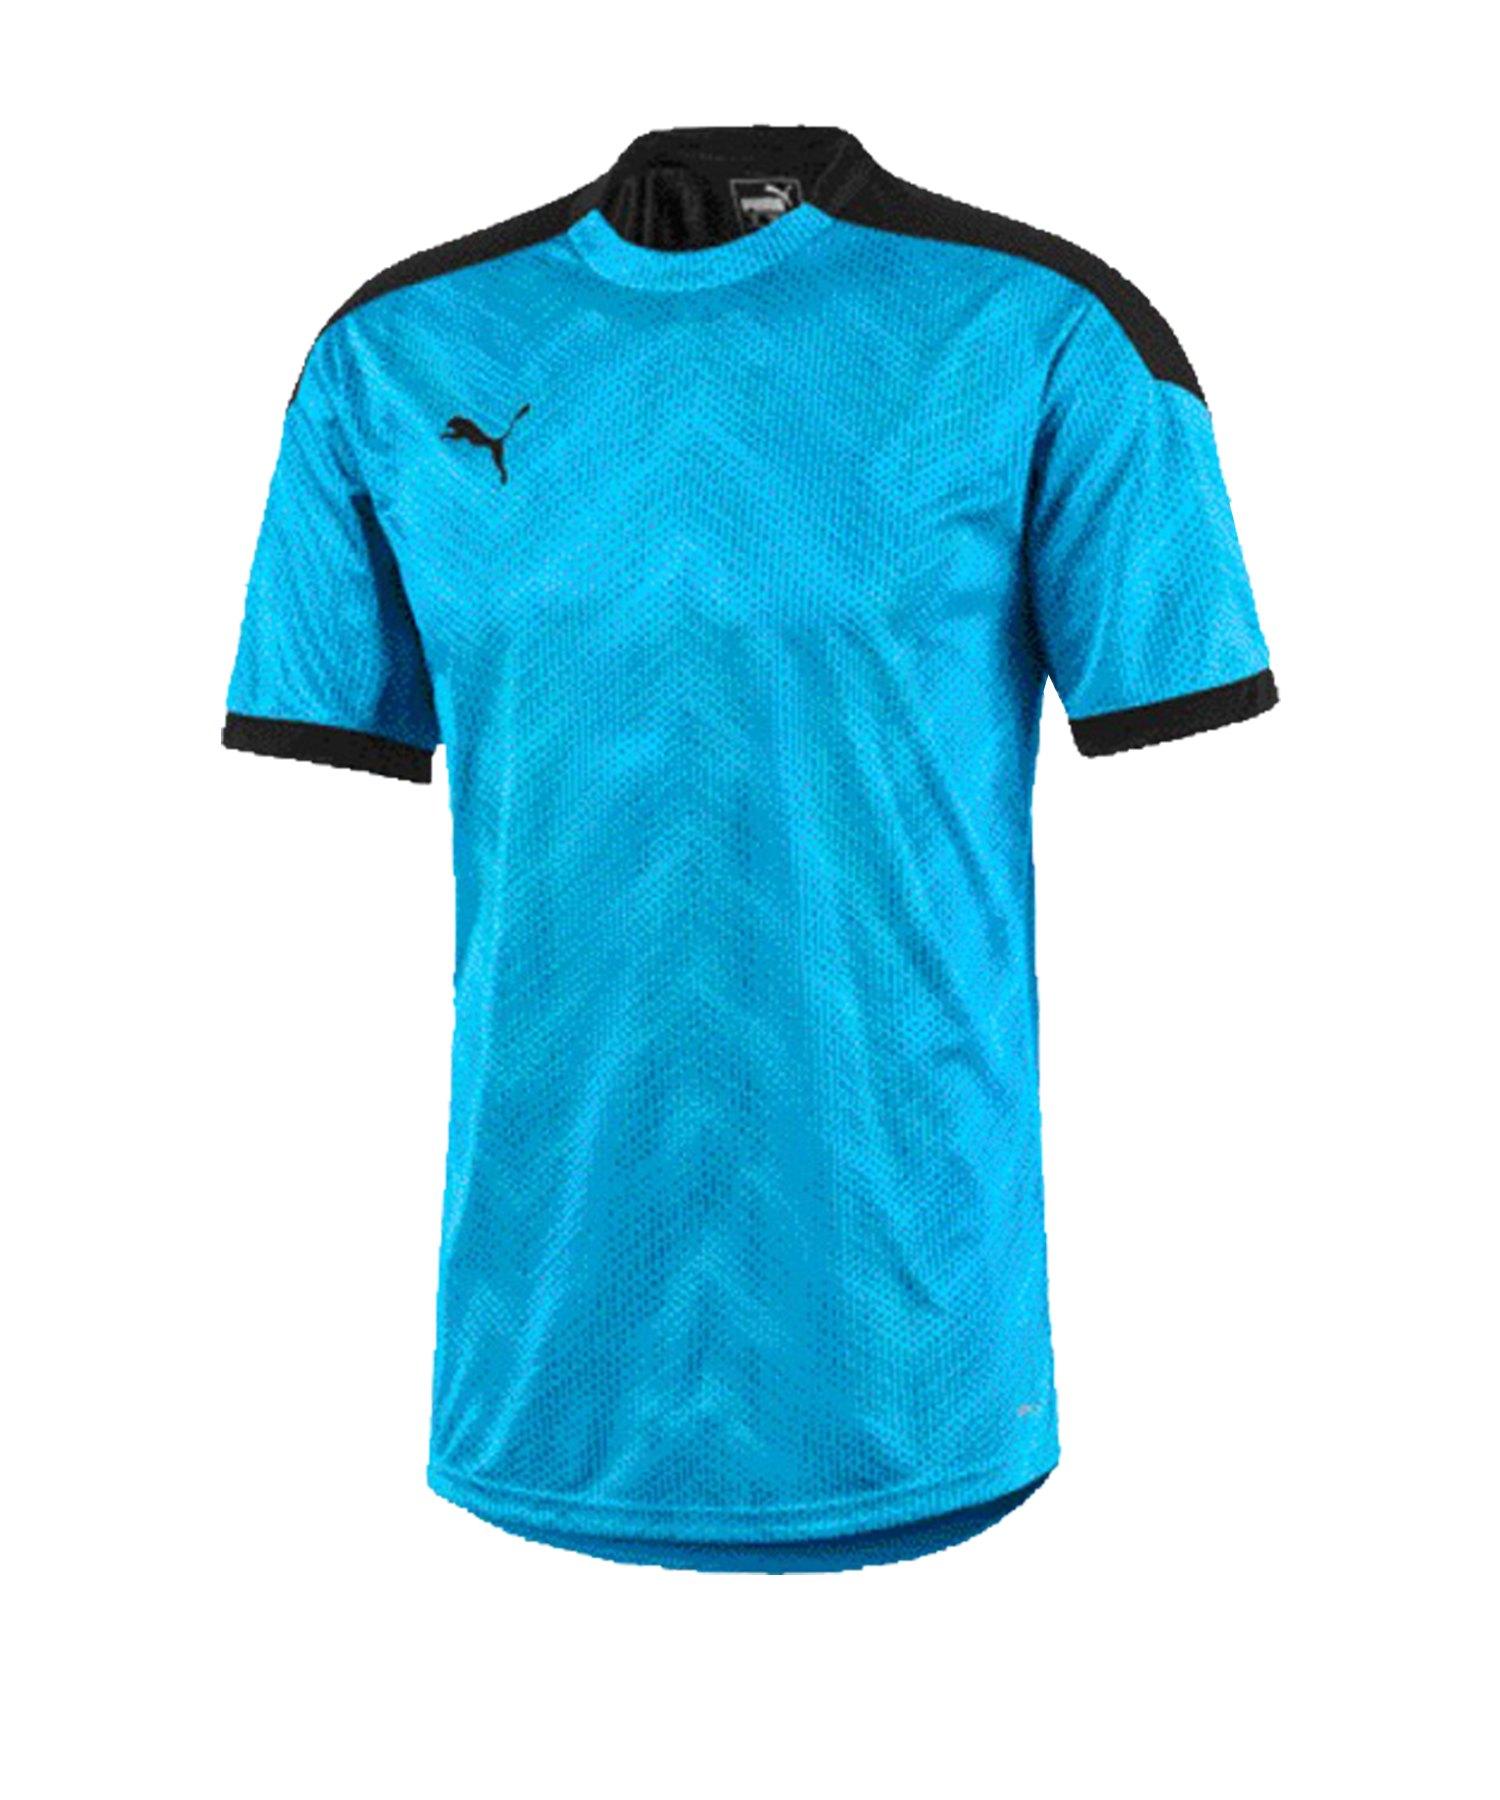 PUMA ftblNXT Graphic T-Shirt Kids Blau Schwarz F02 - blau